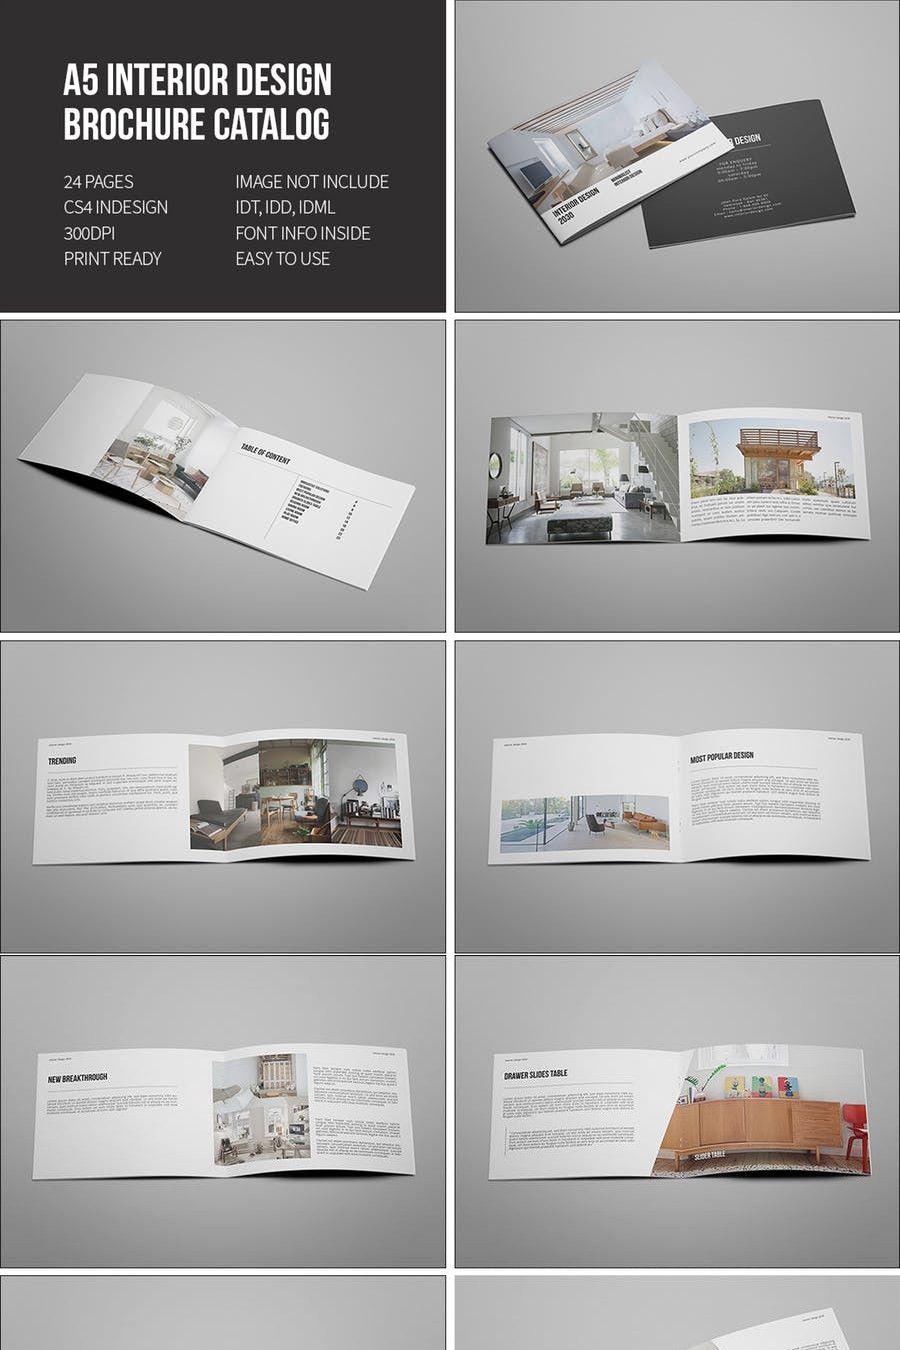 Interior Design Brochure Catalog Brochure Design Catalog Design Quality Interior Design